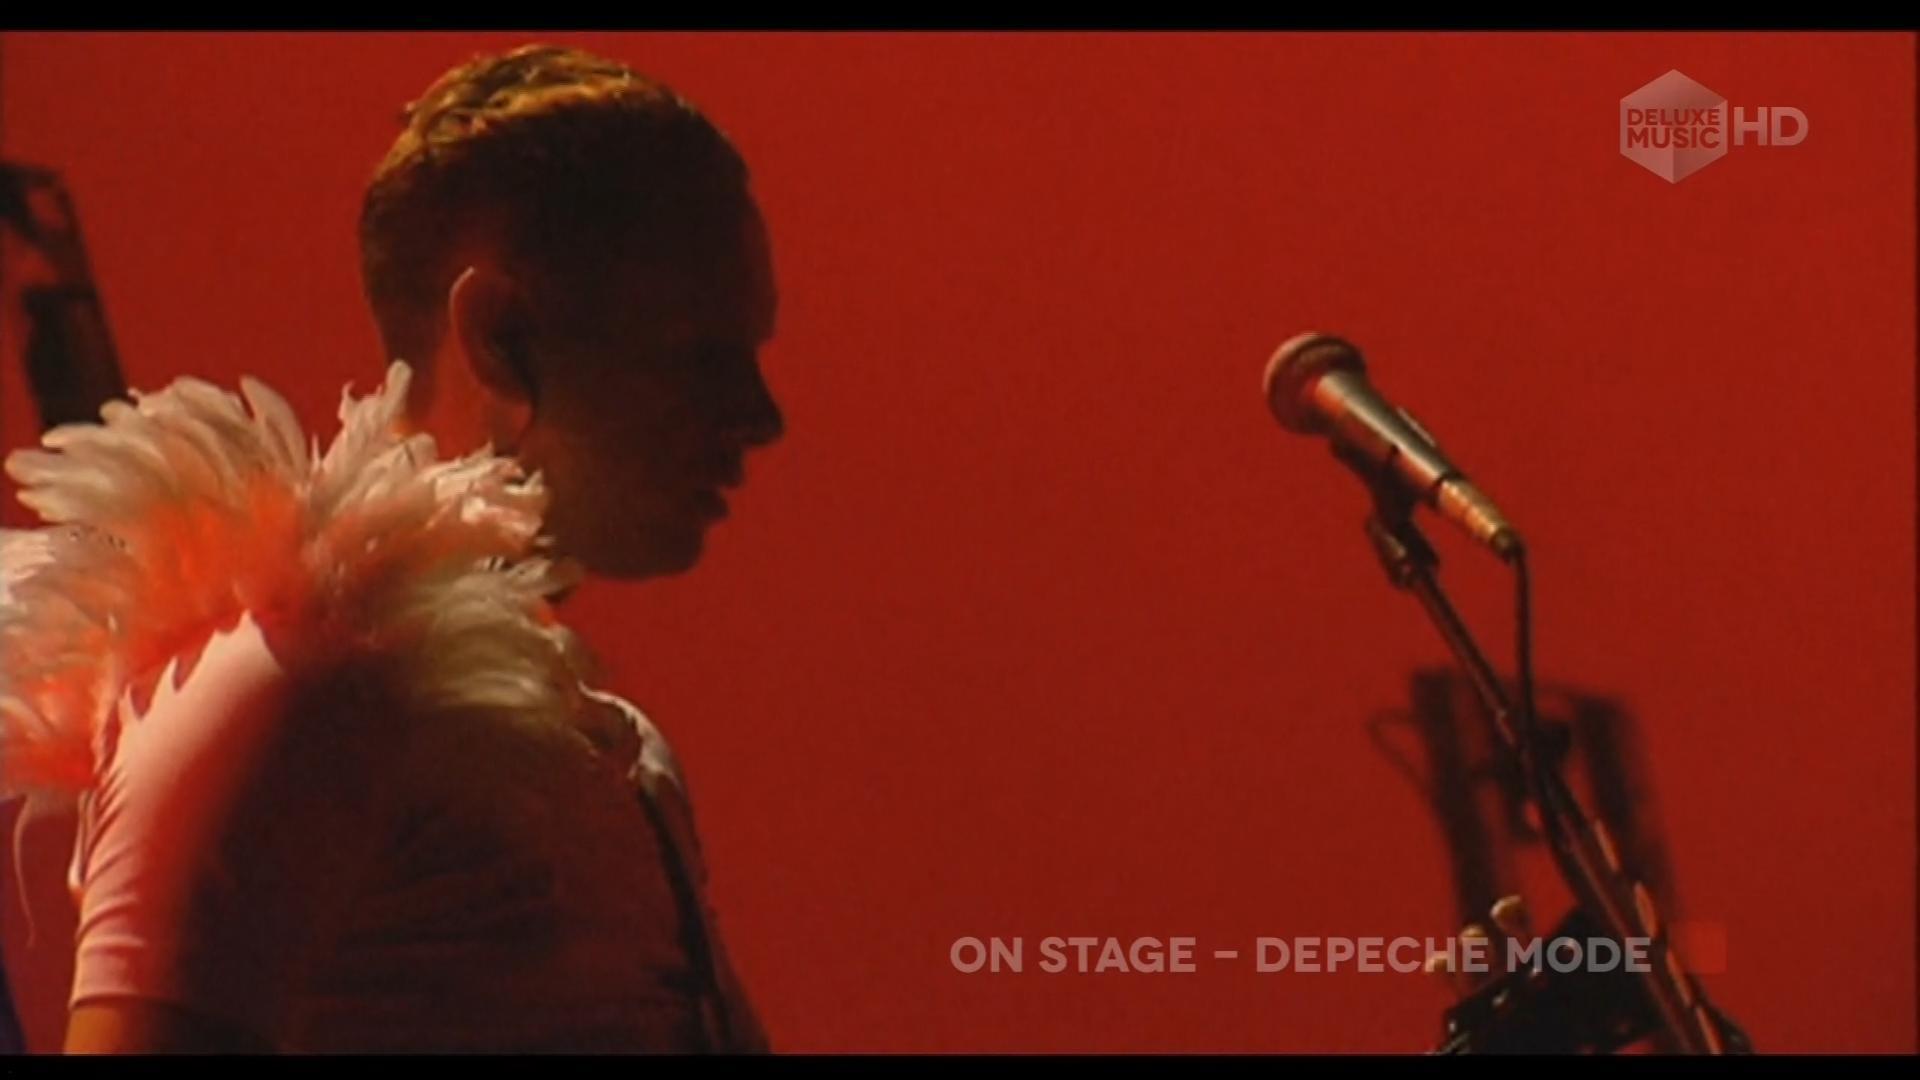 Depeche Mode One Night In Paris Video 2002 Photo